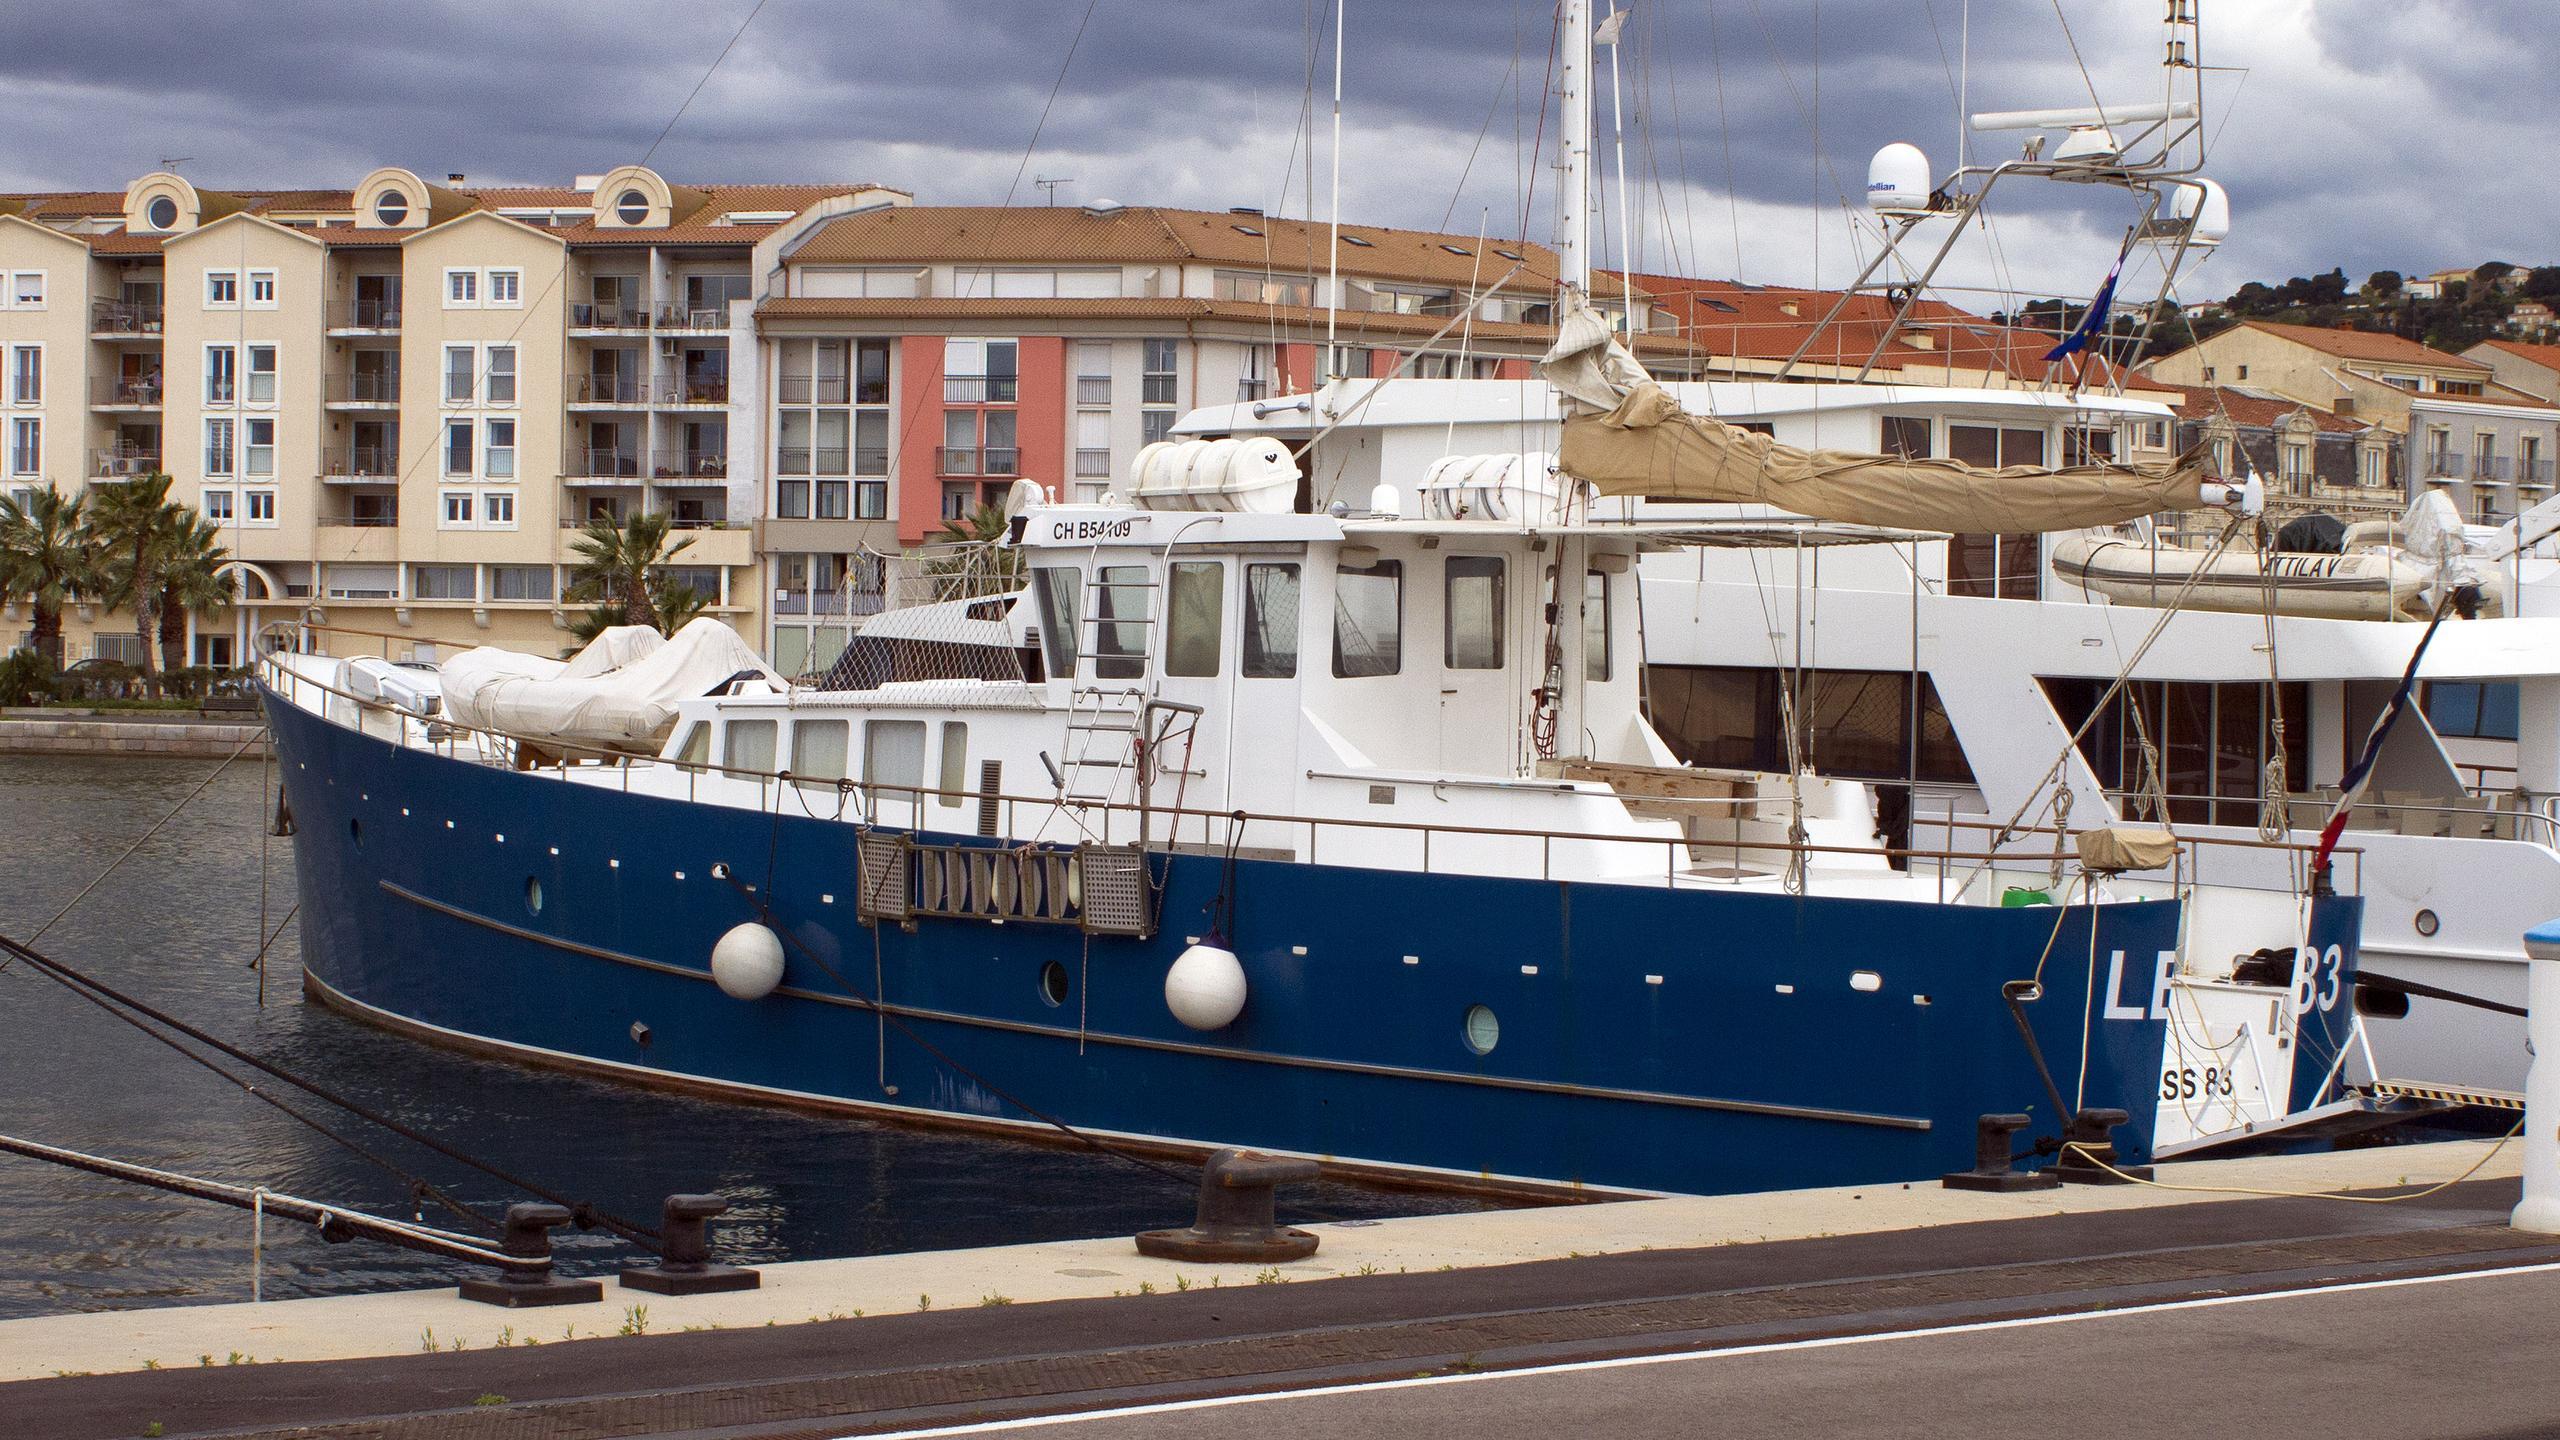 less-83-motor-yacht-cmn-2001-35m-half-profile